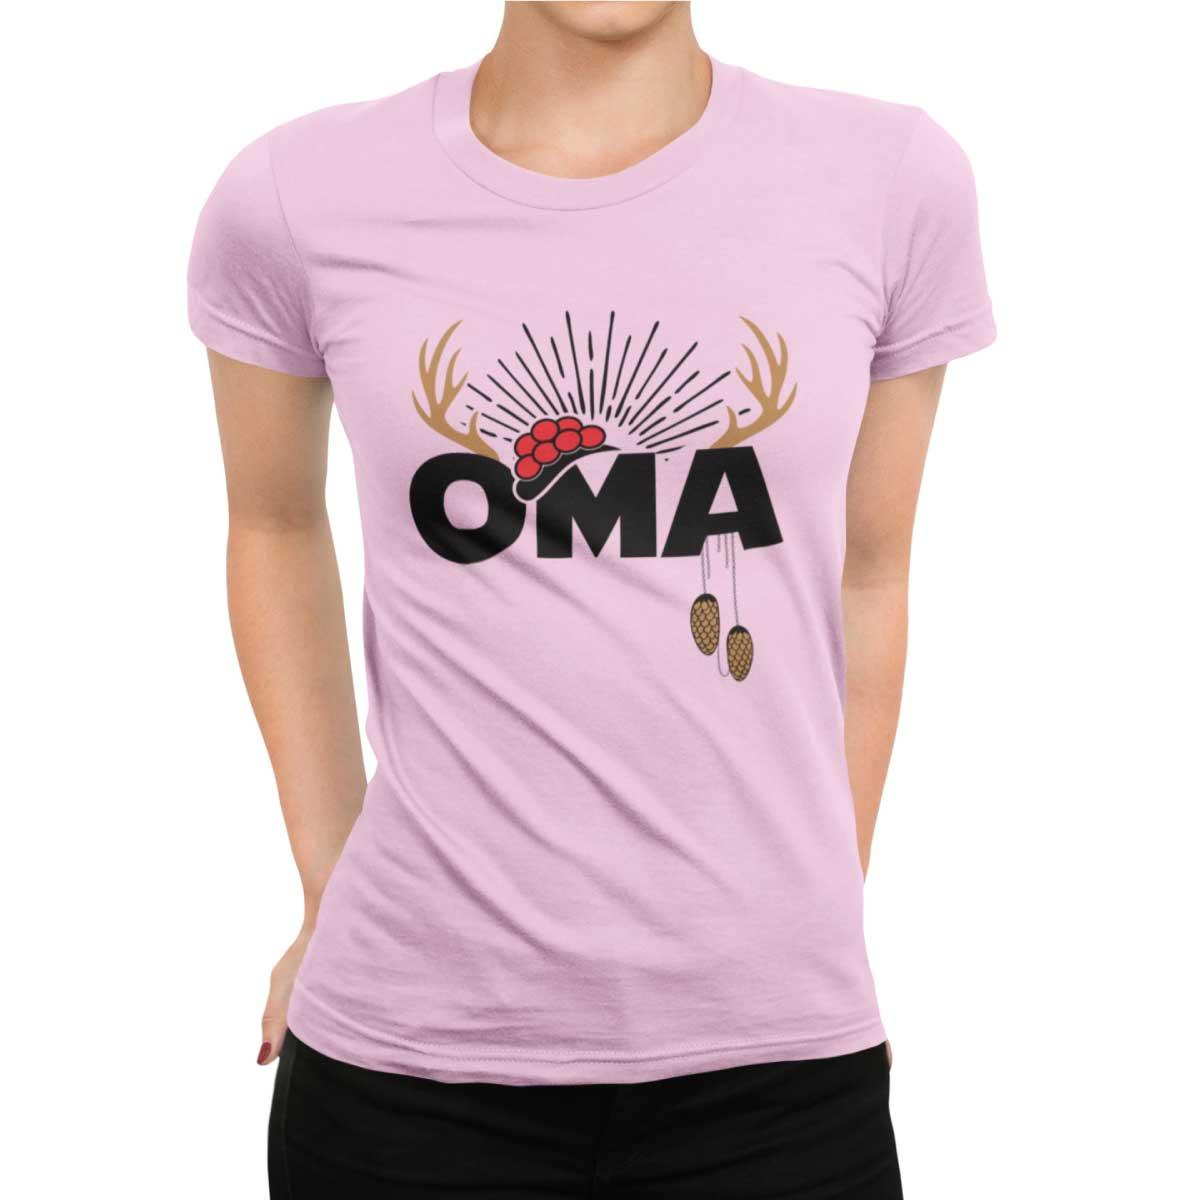 Schwarzwald-Oma-Black-Edition-T-Shirt-Motiv